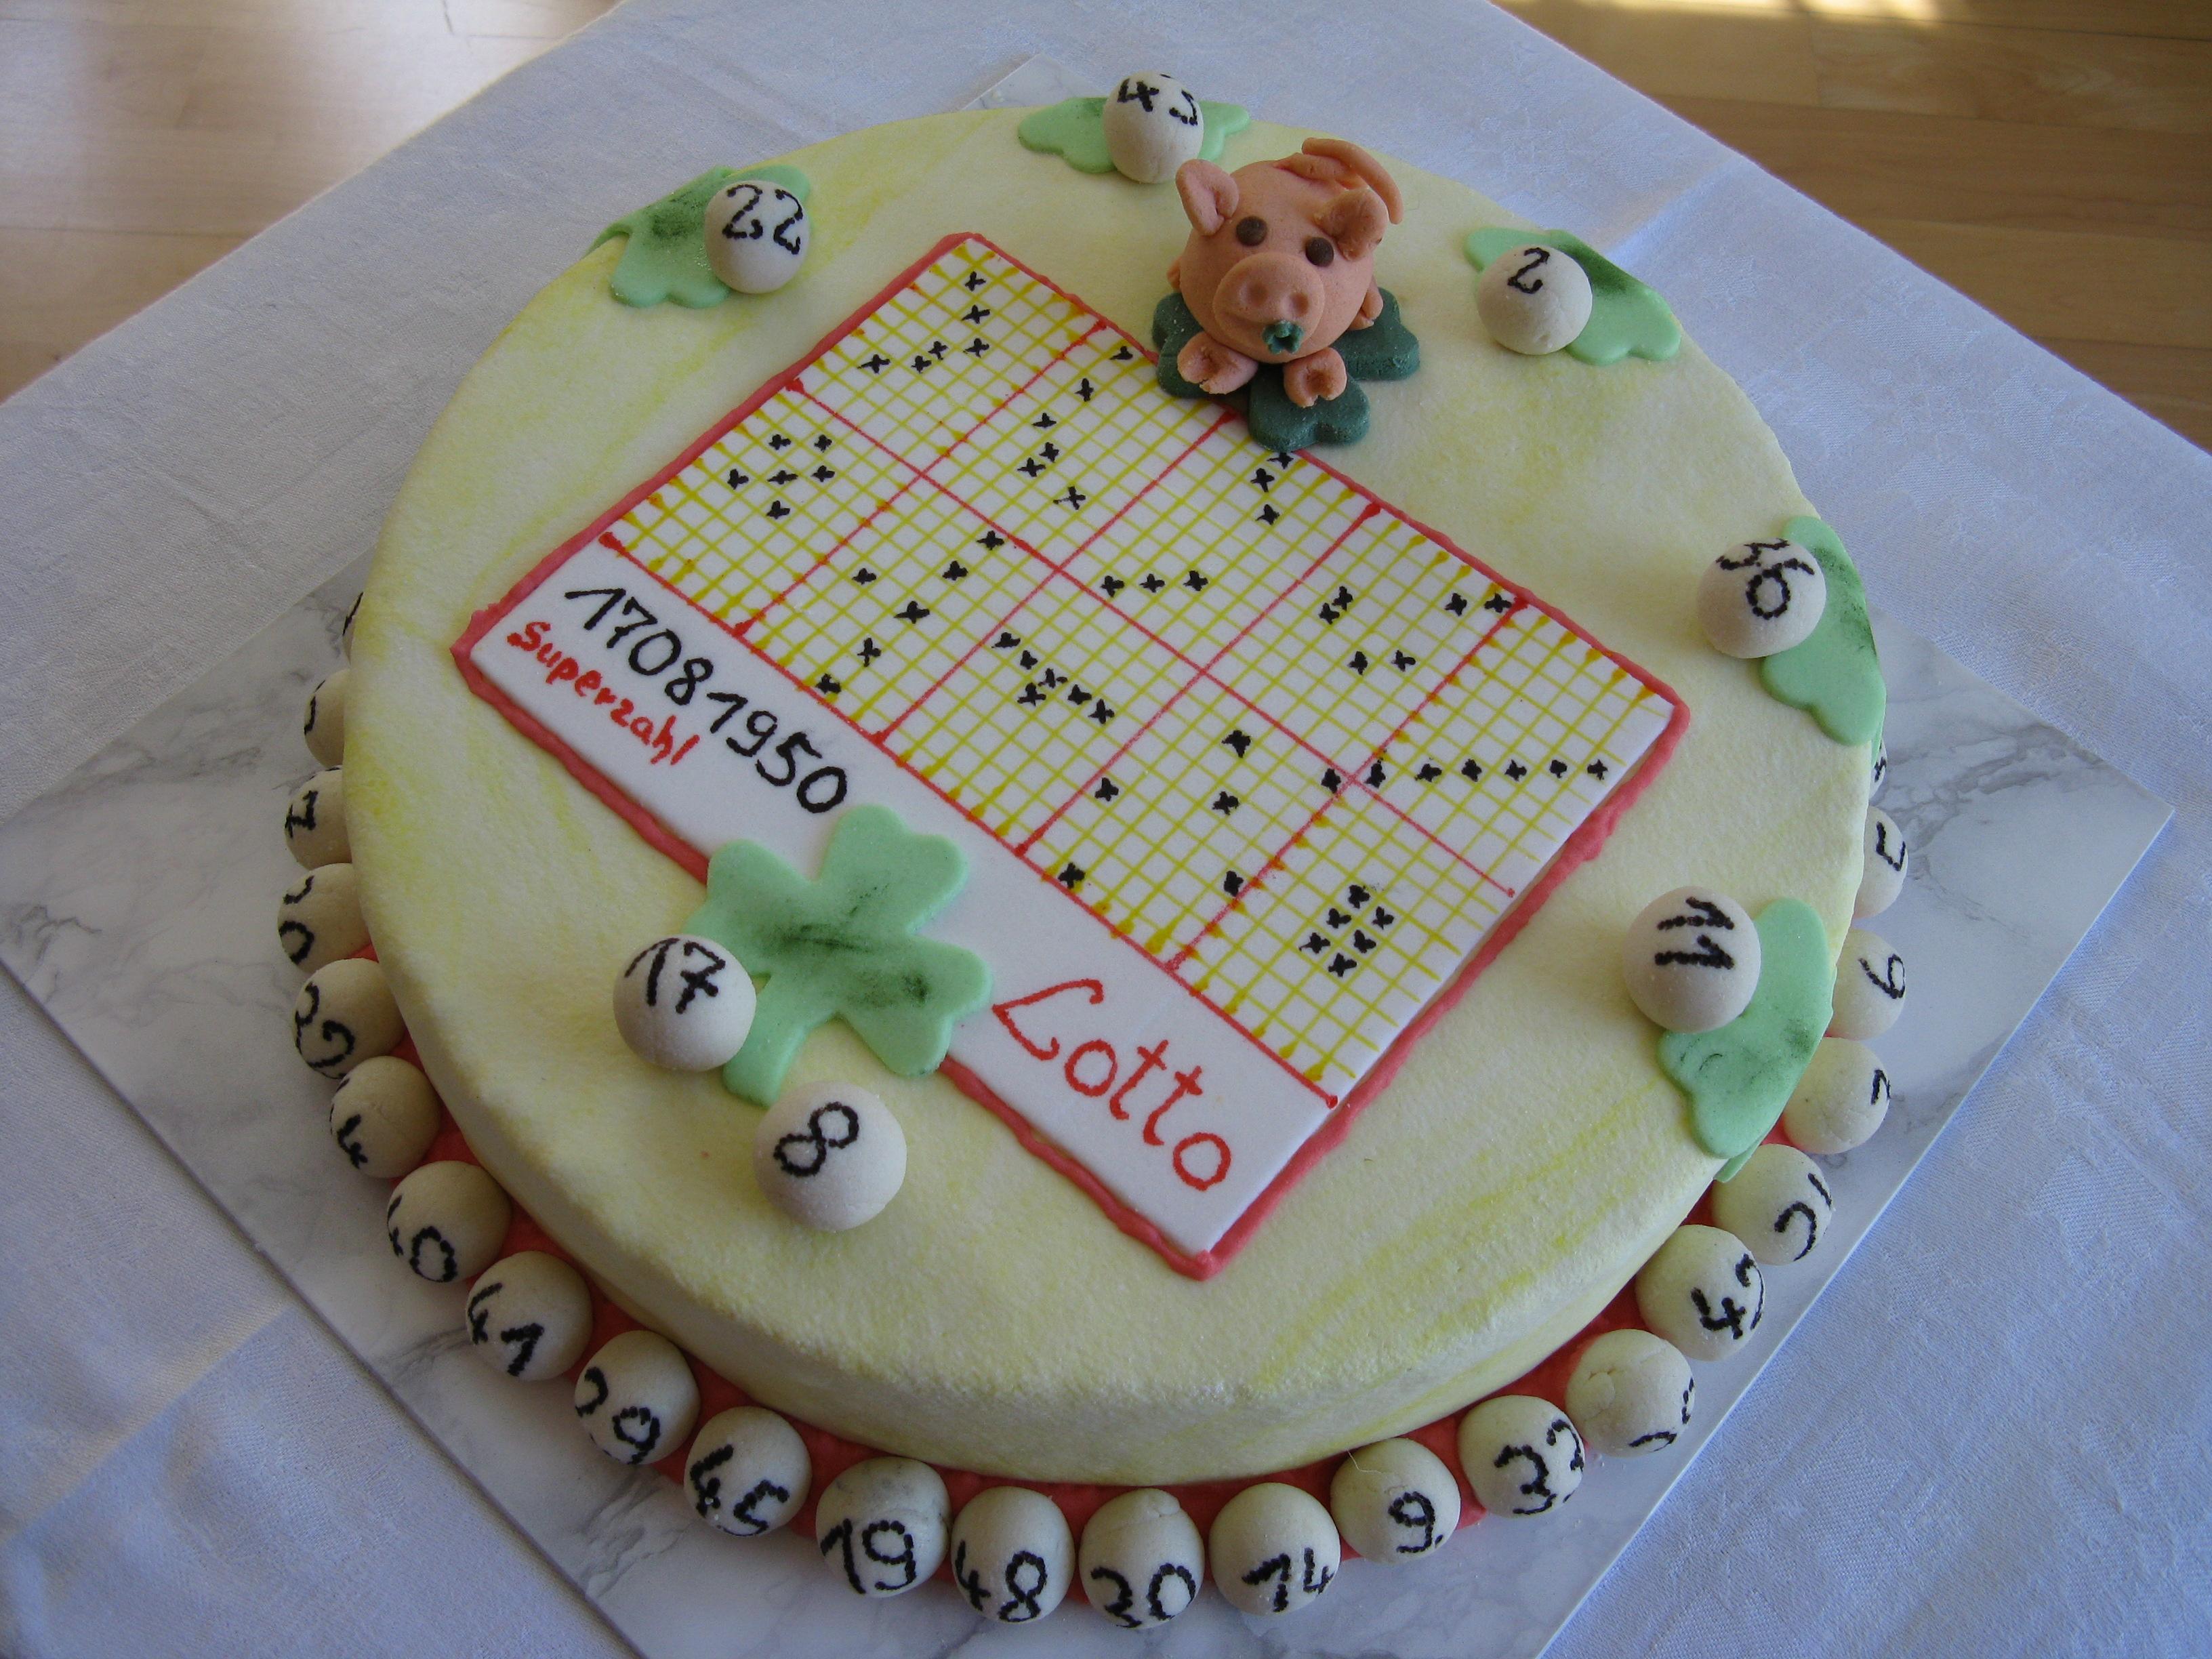 Lotto Geburtstag